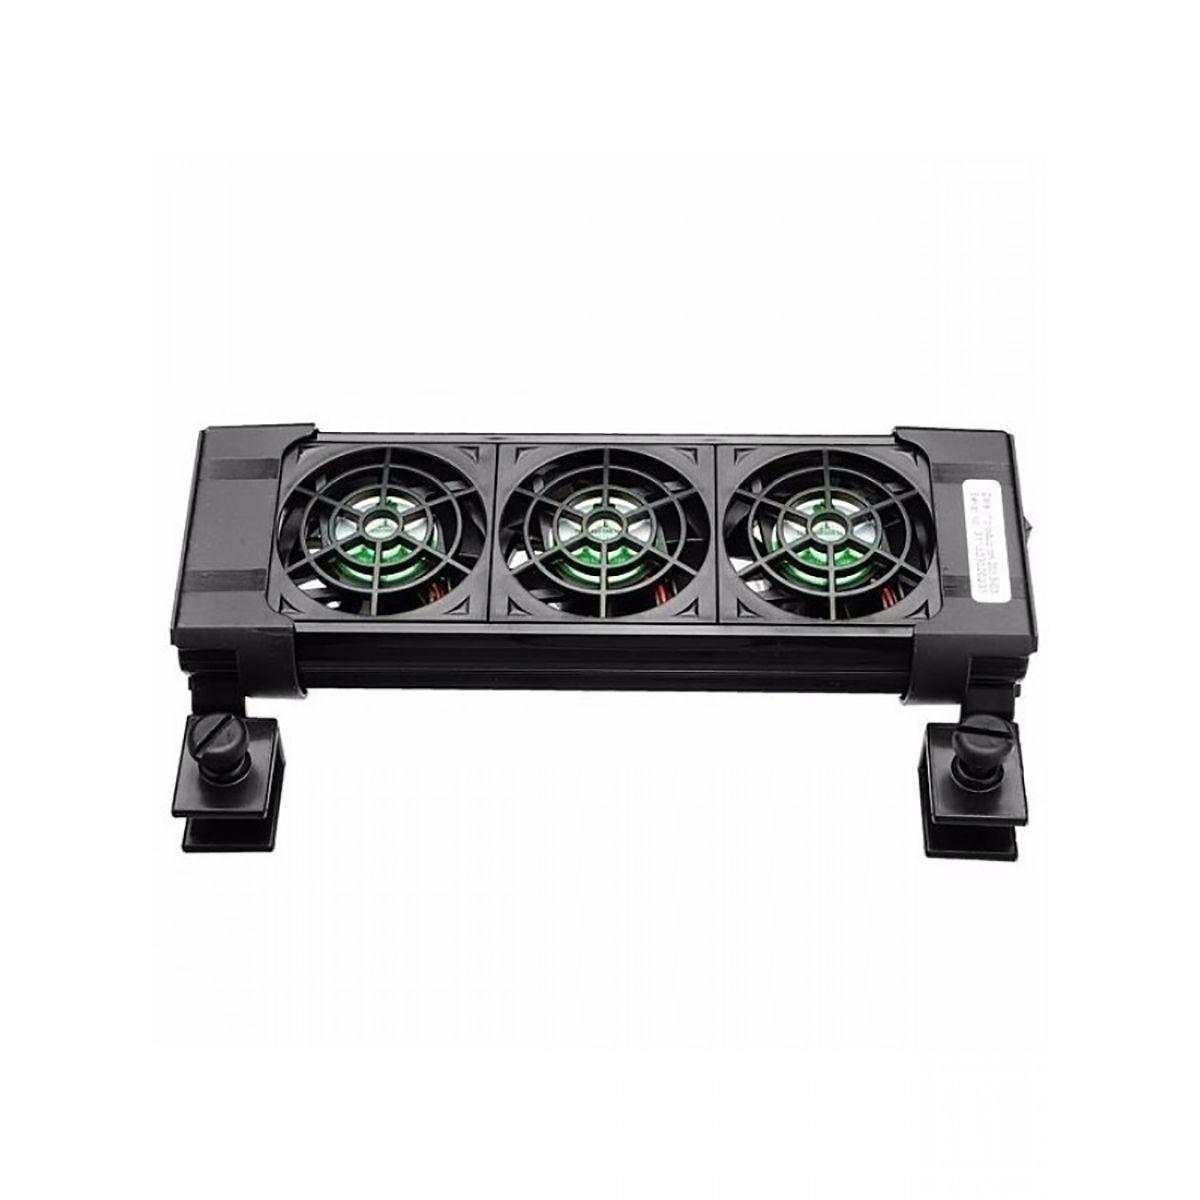 Mini Ventilador Boyu (cooling Fan) Fs-603 Triplo - Bivolt